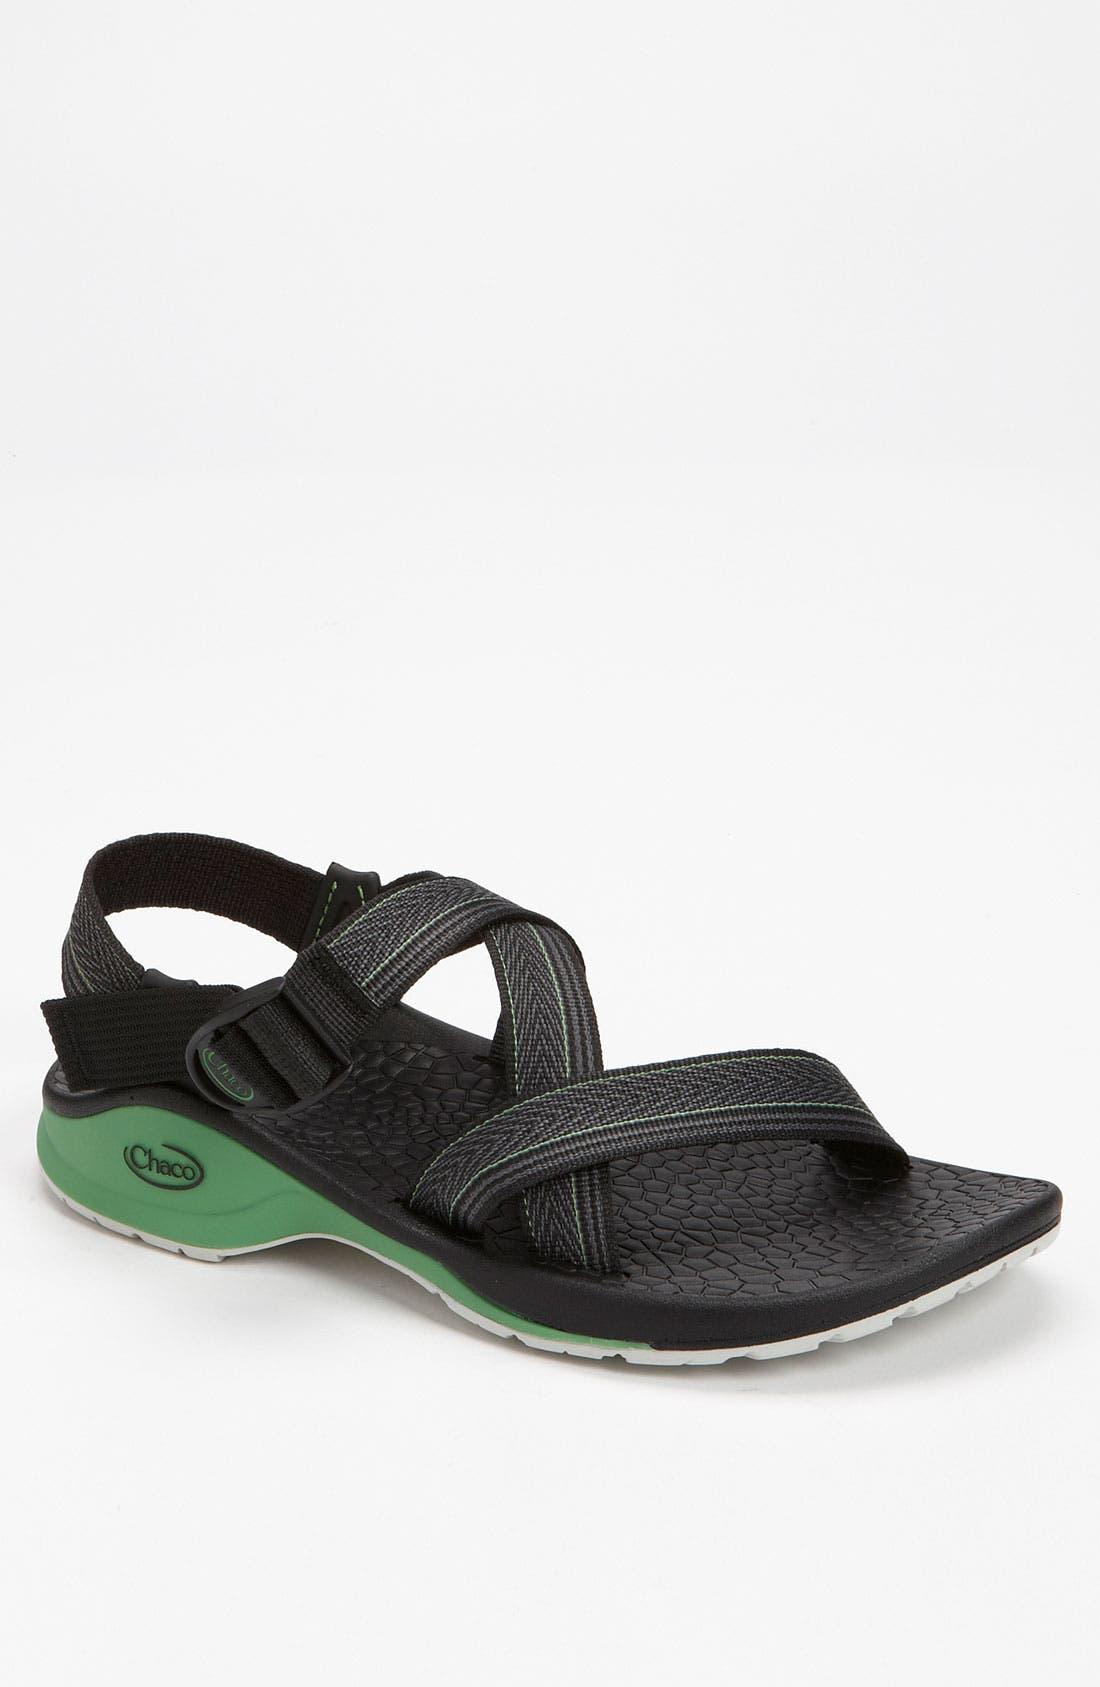 Main Image - Chaco 'Updraft' Sandal